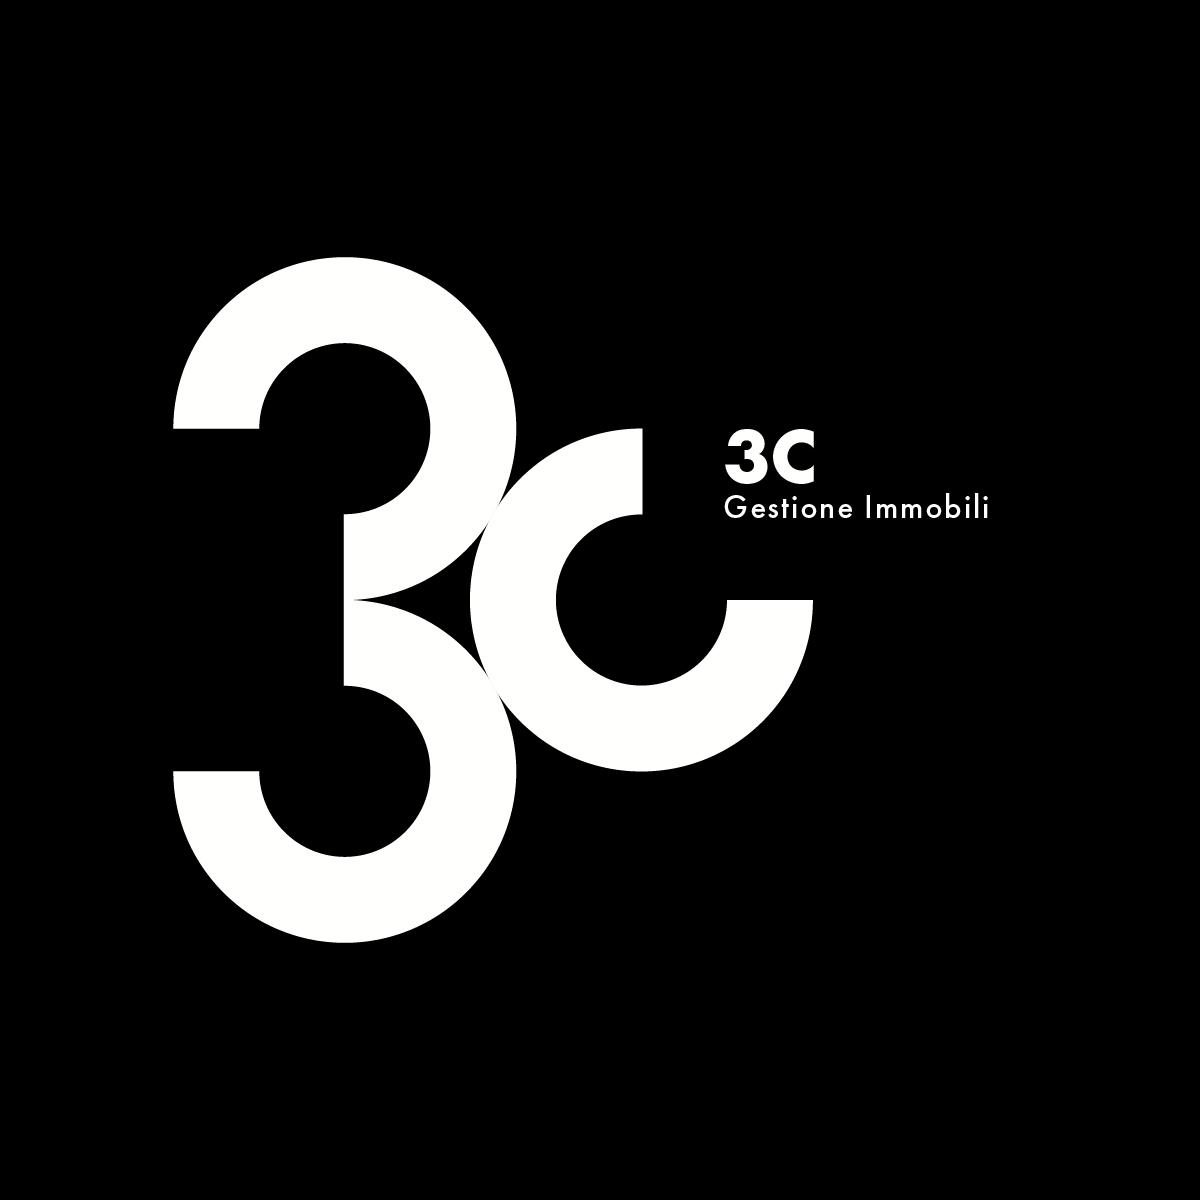 3C-Gestione-Immobili-001